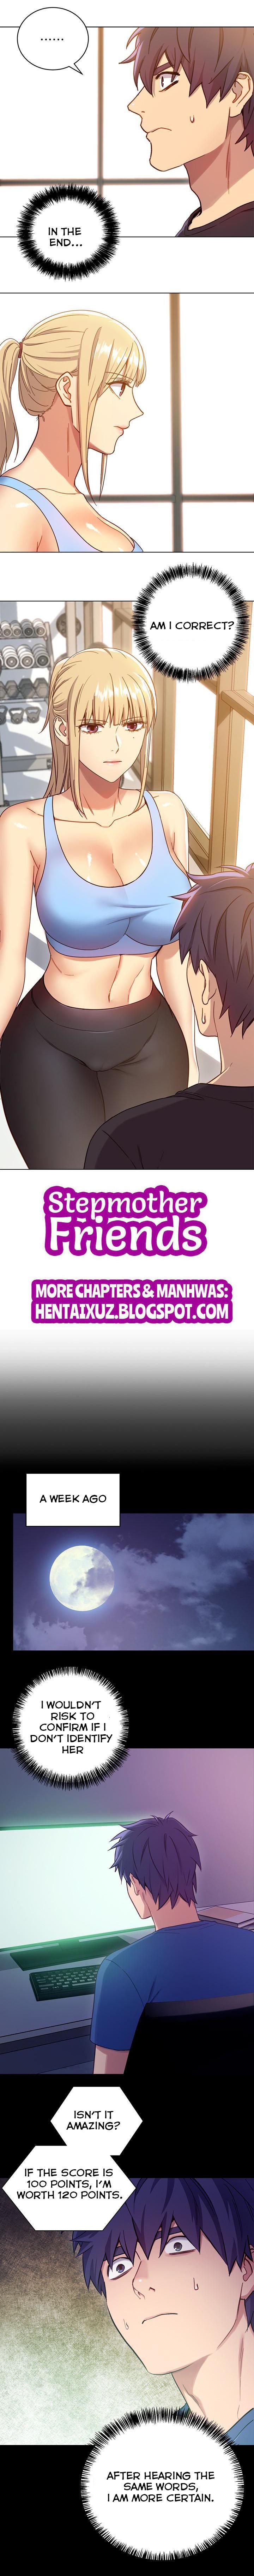 Stepmother Friends Ch.29/? 78